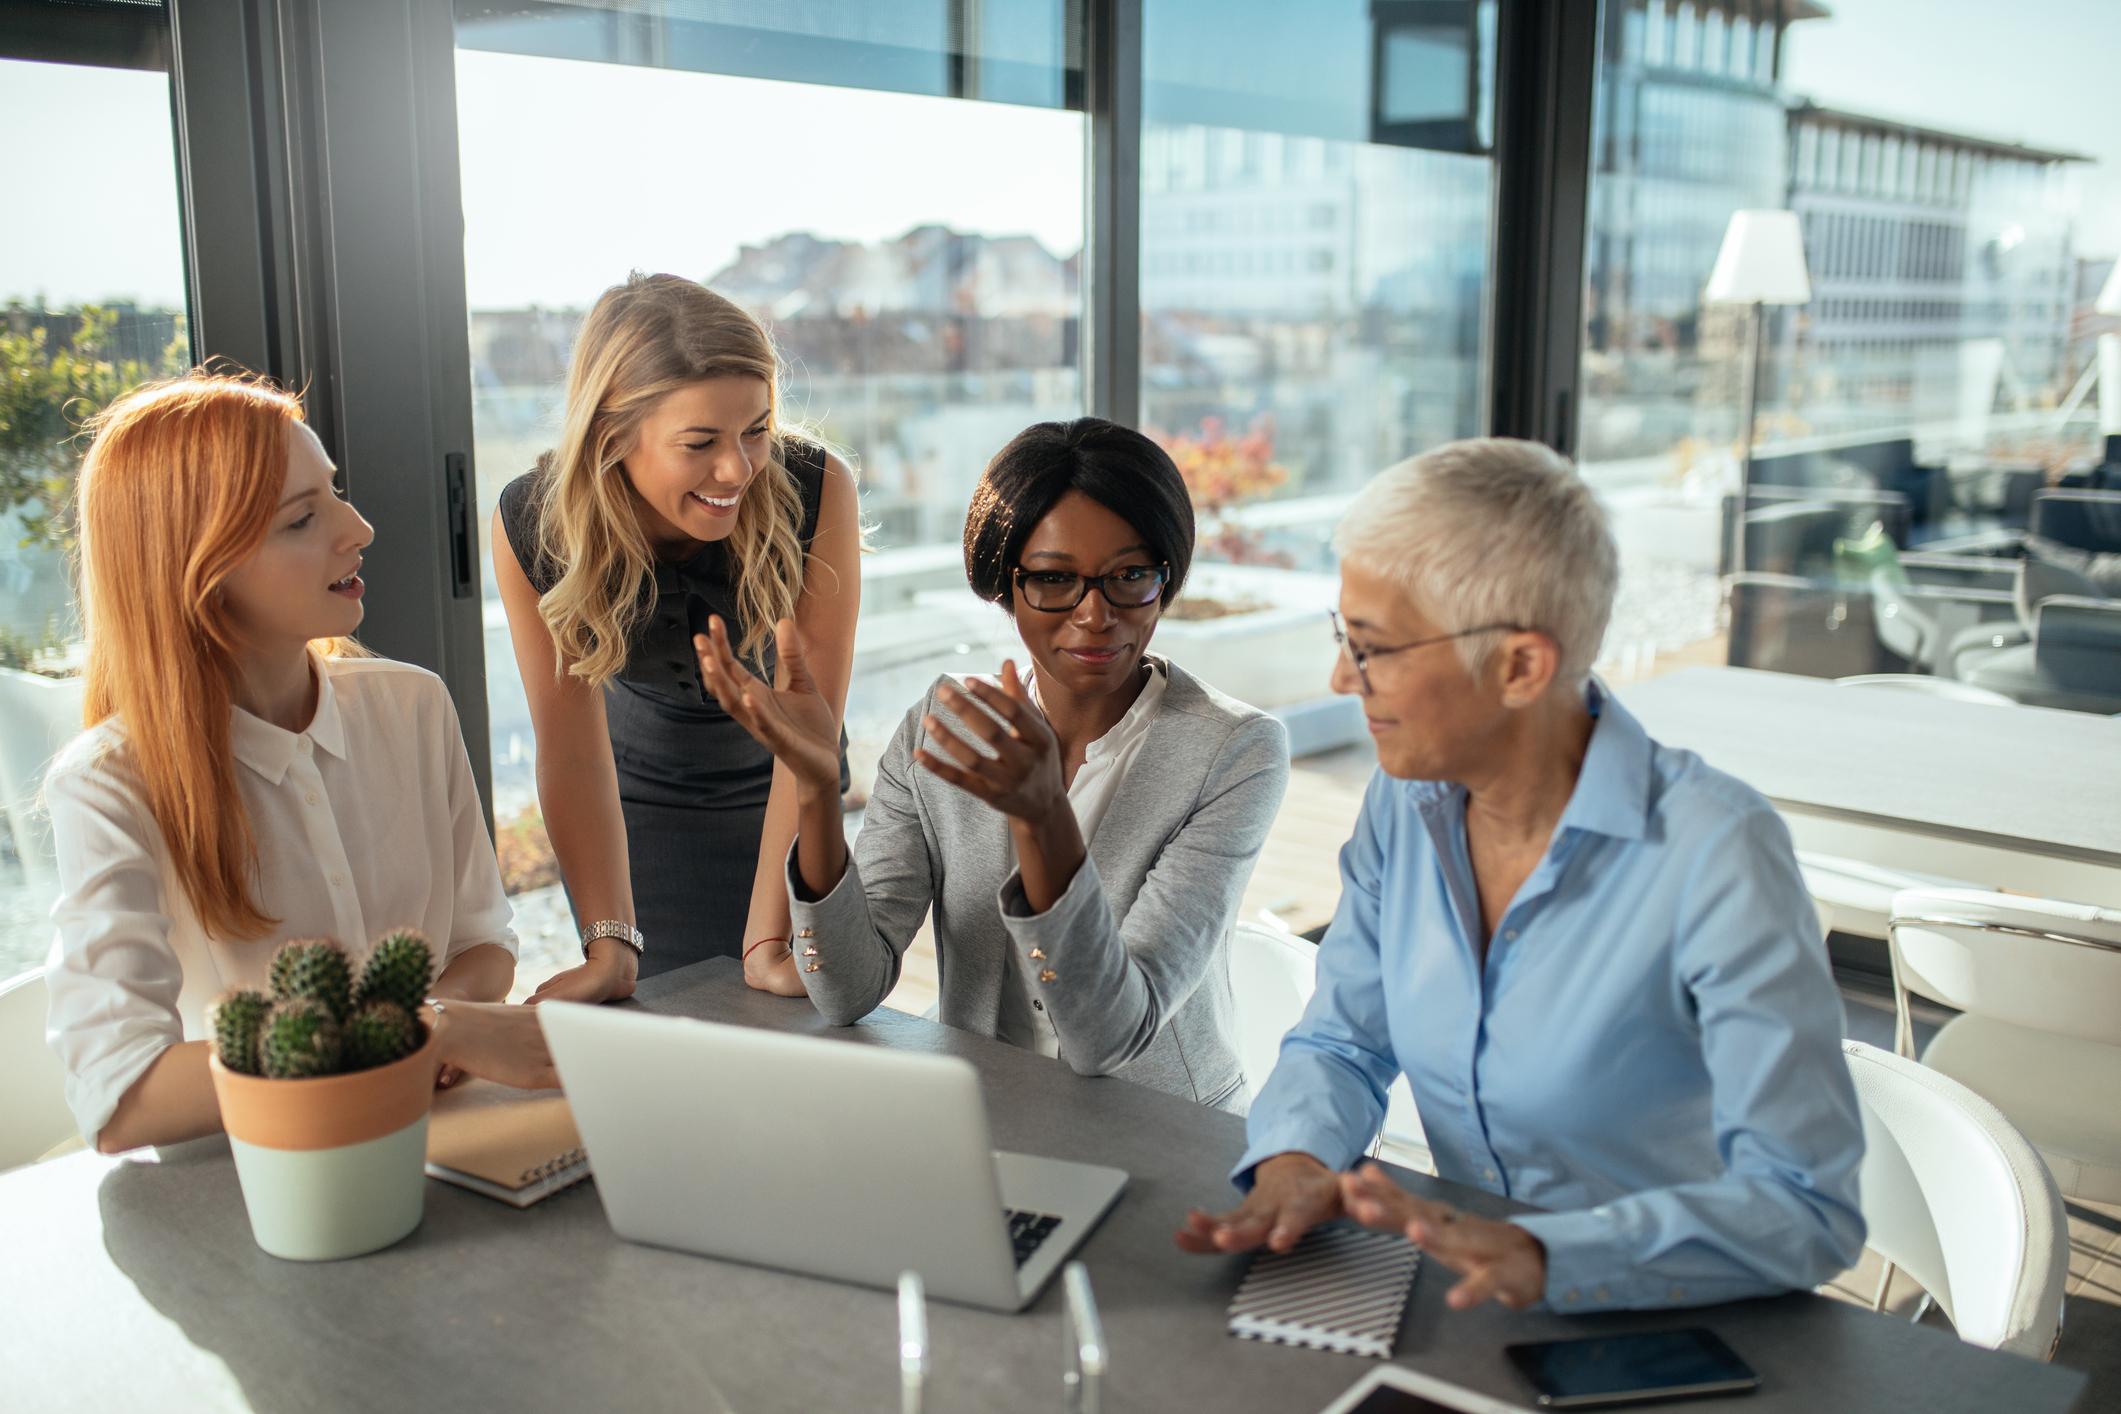 Stock photo of four businesswomen meeting